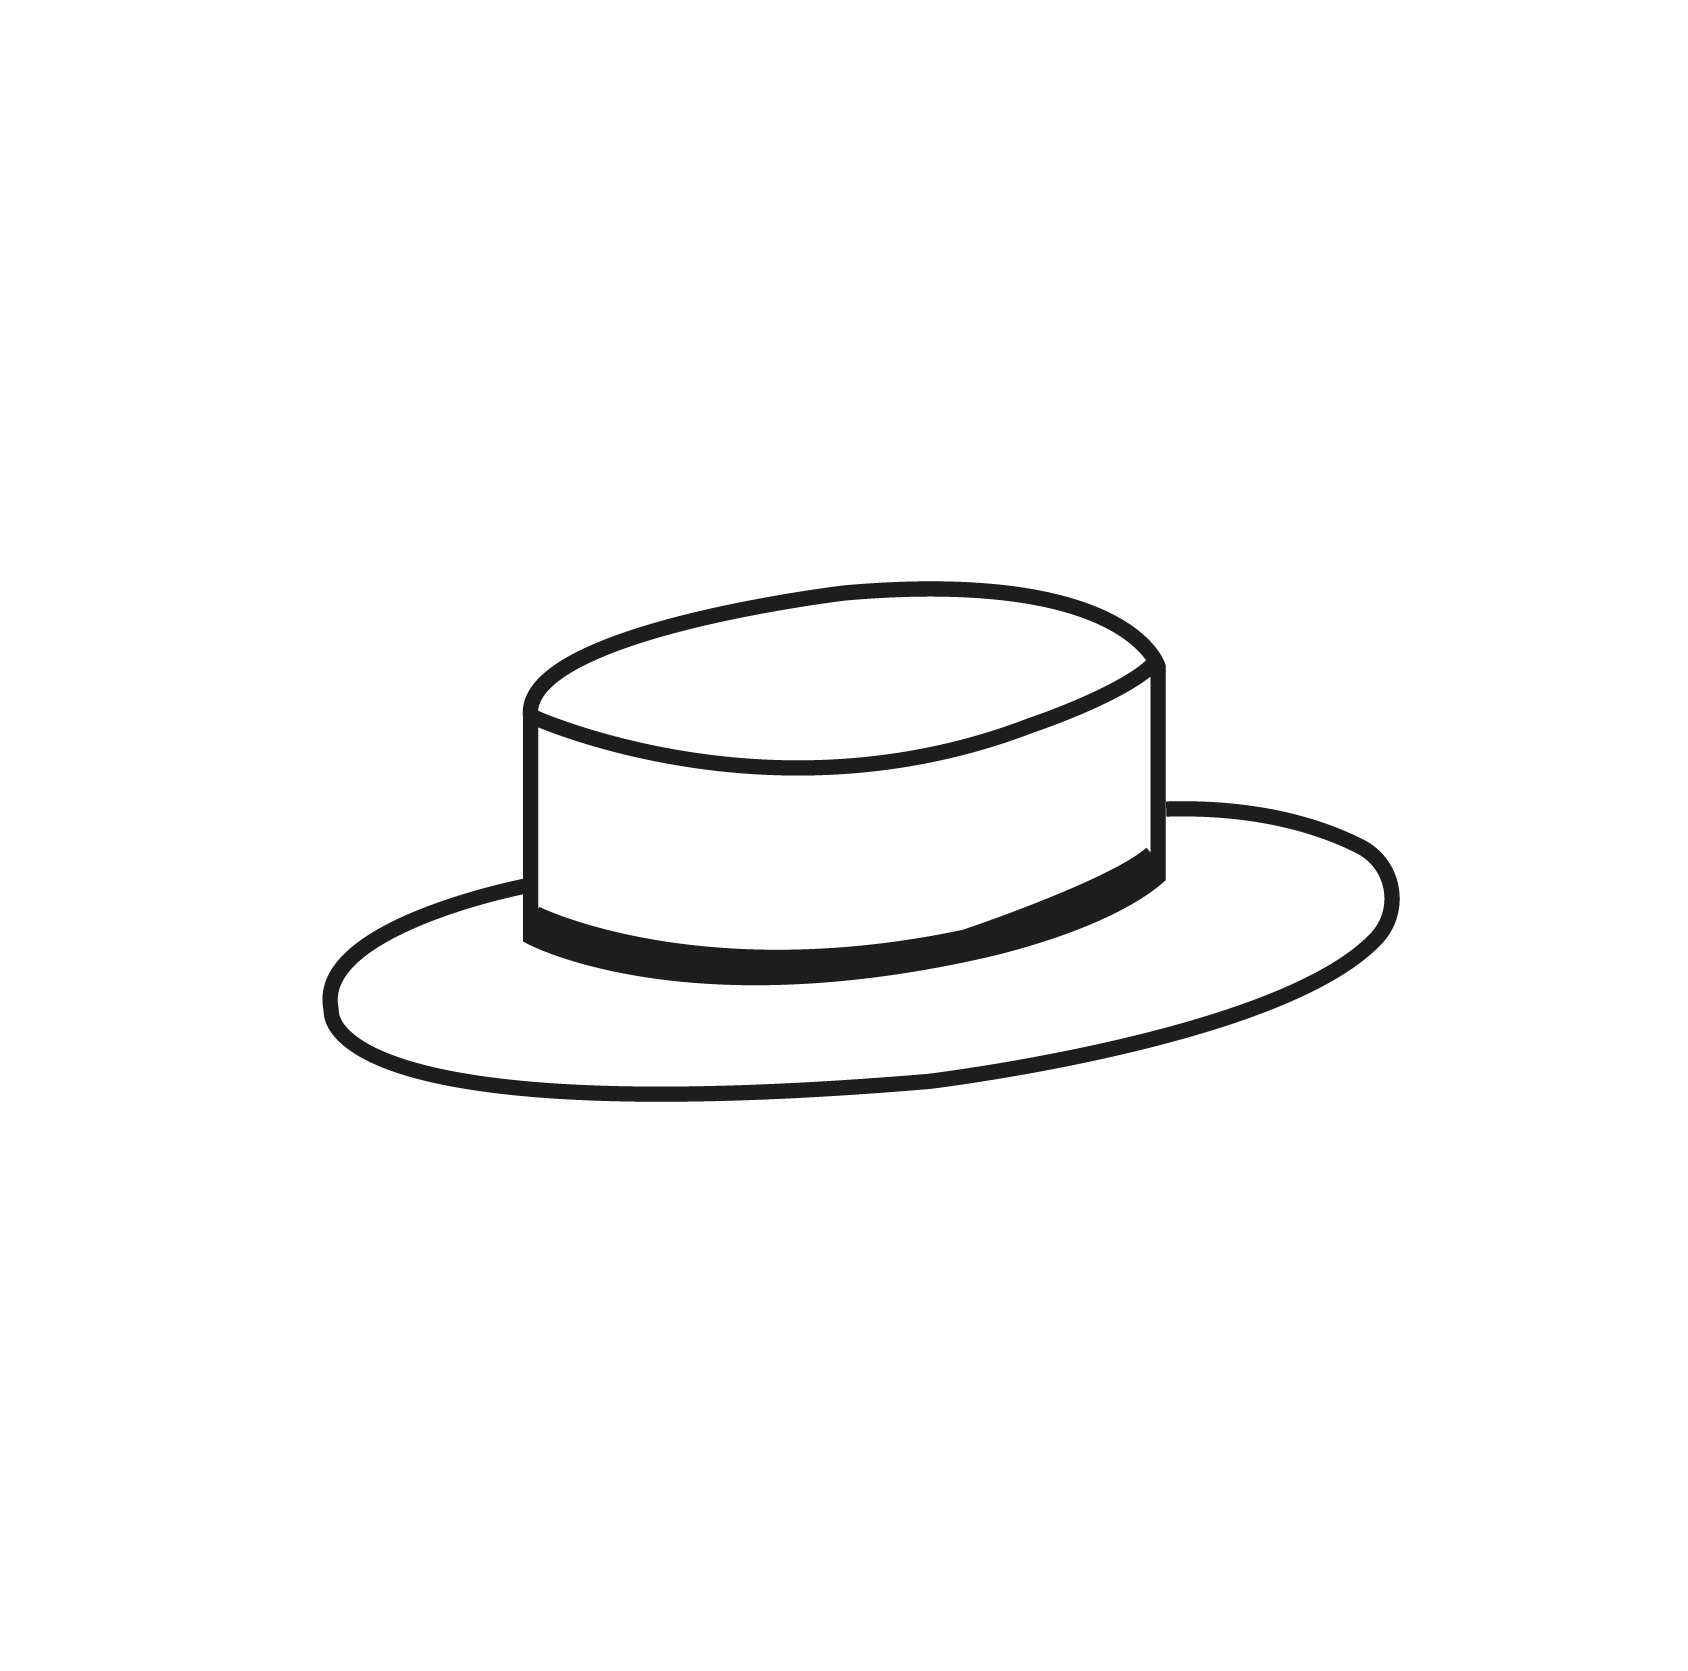 NJB Hat Black 01.png